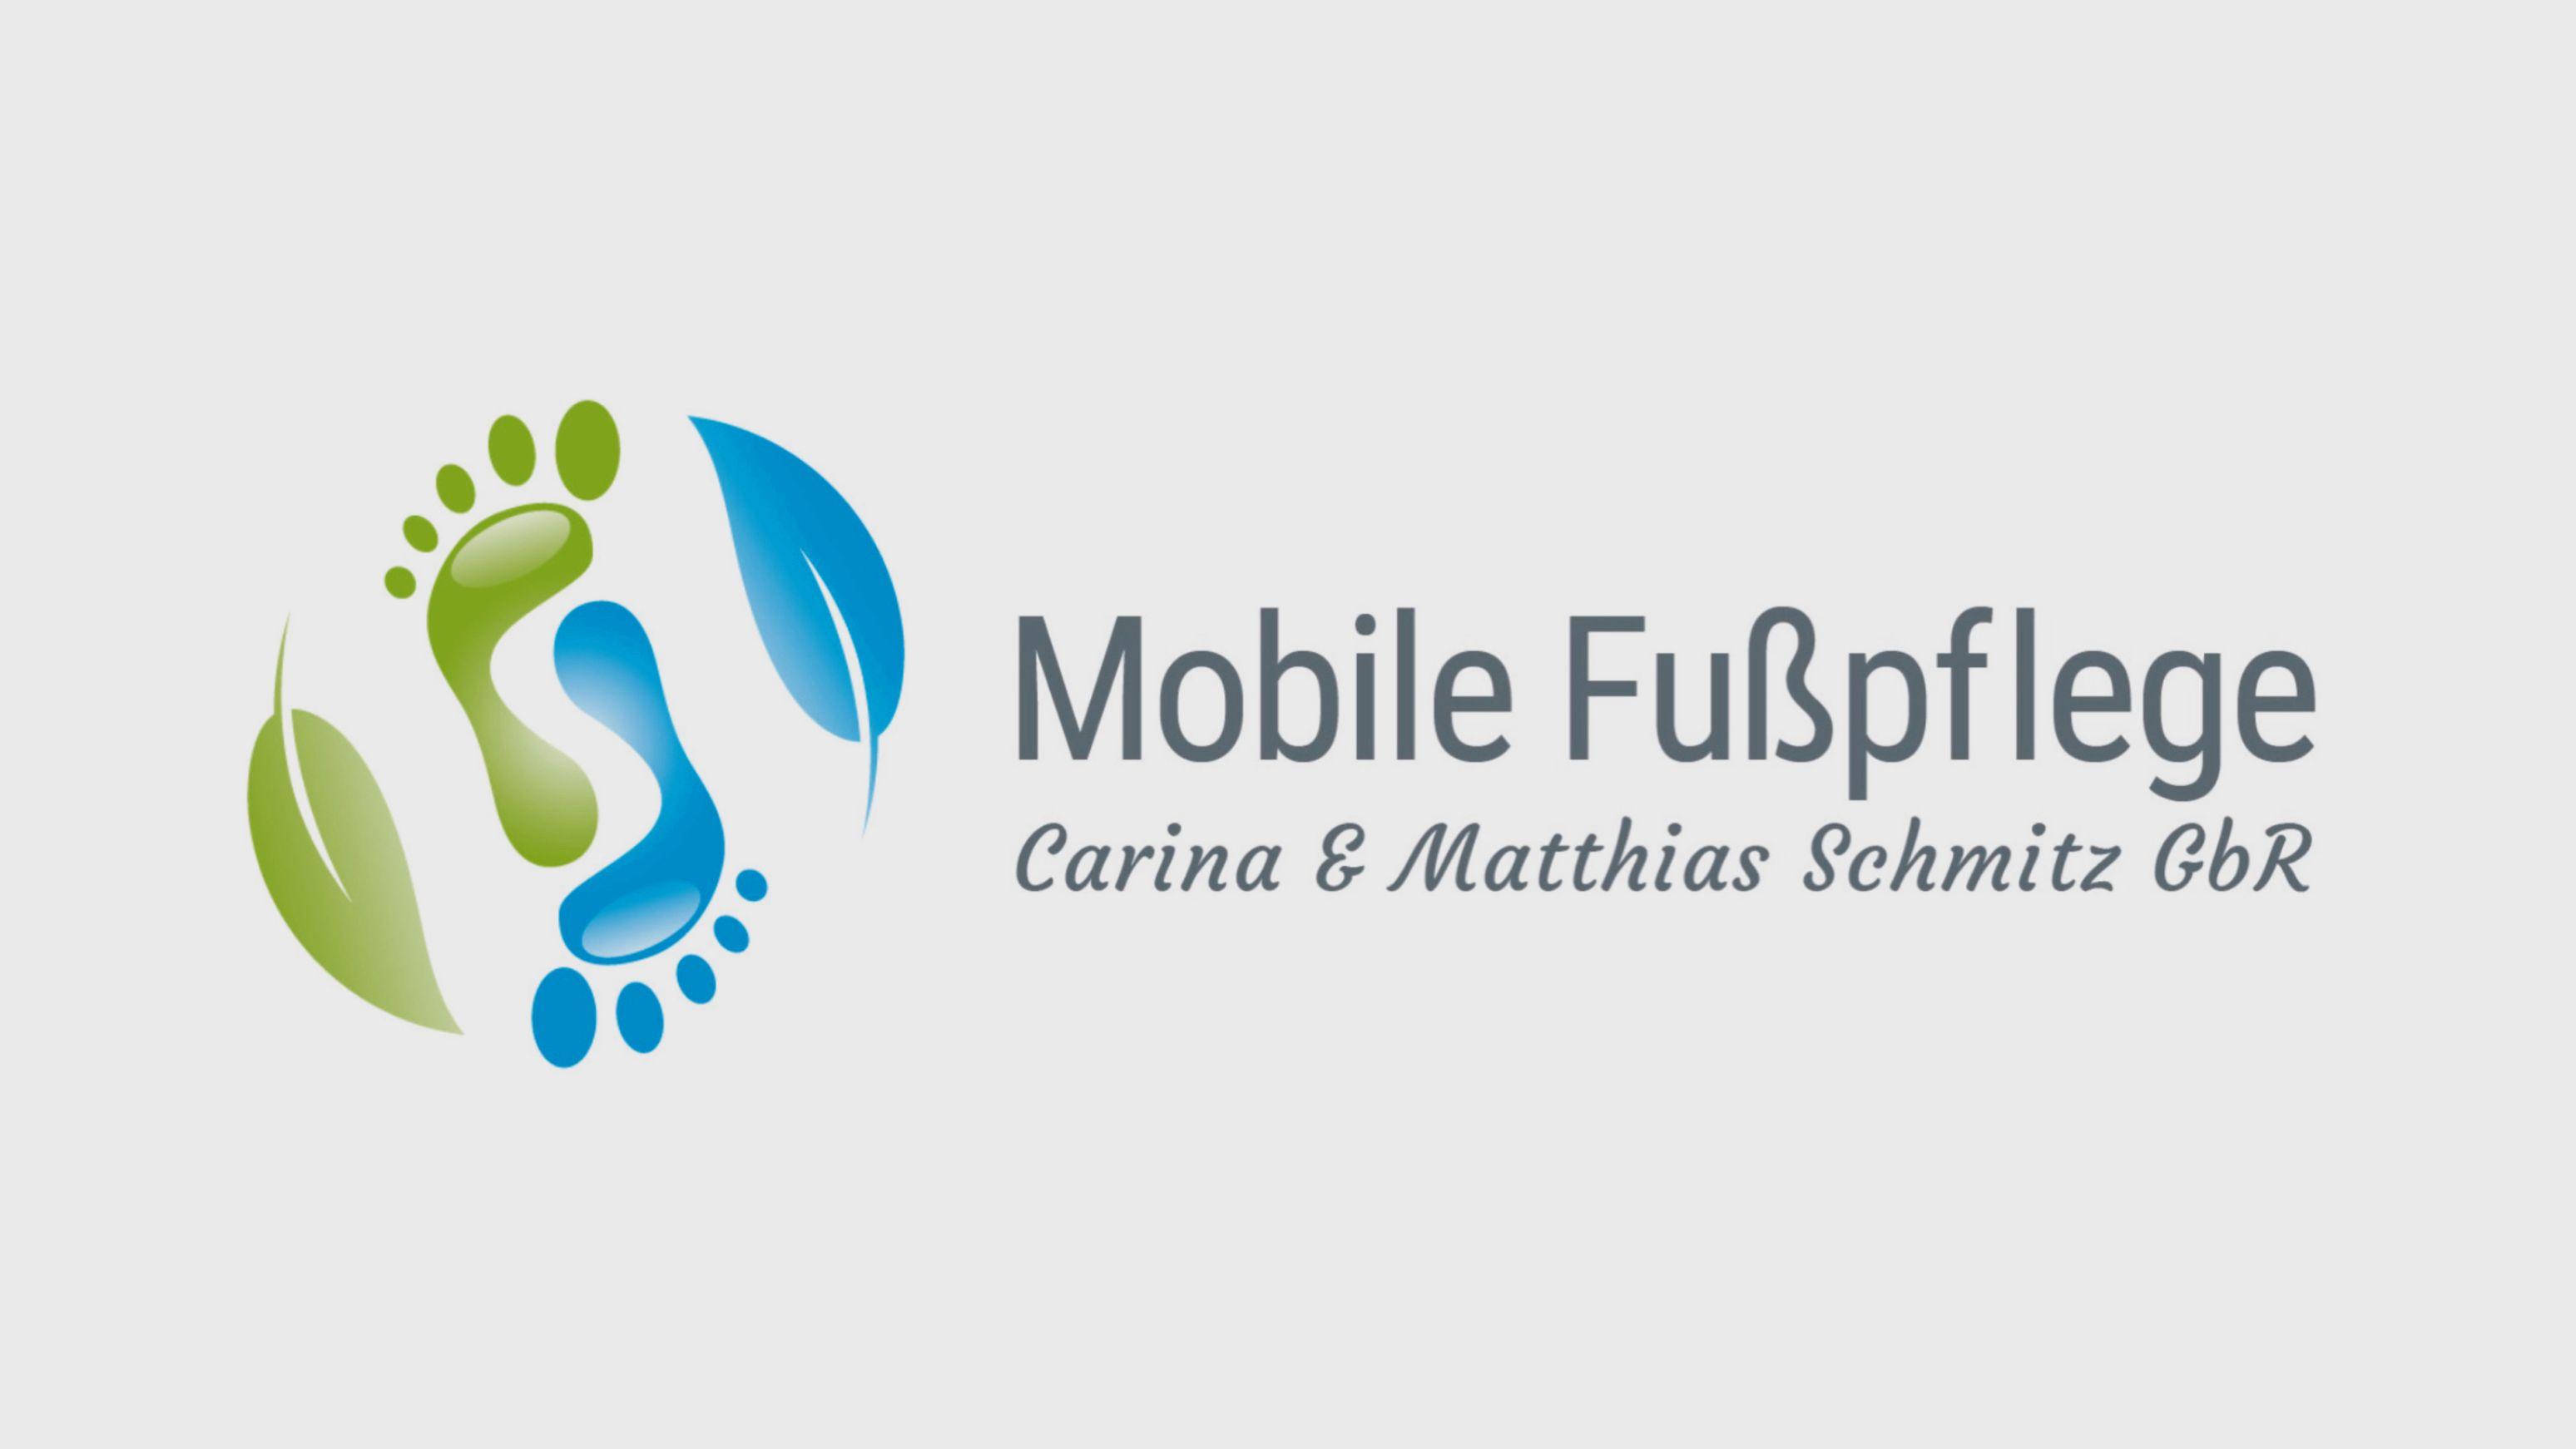 Mobile Fußpflege Duisburg